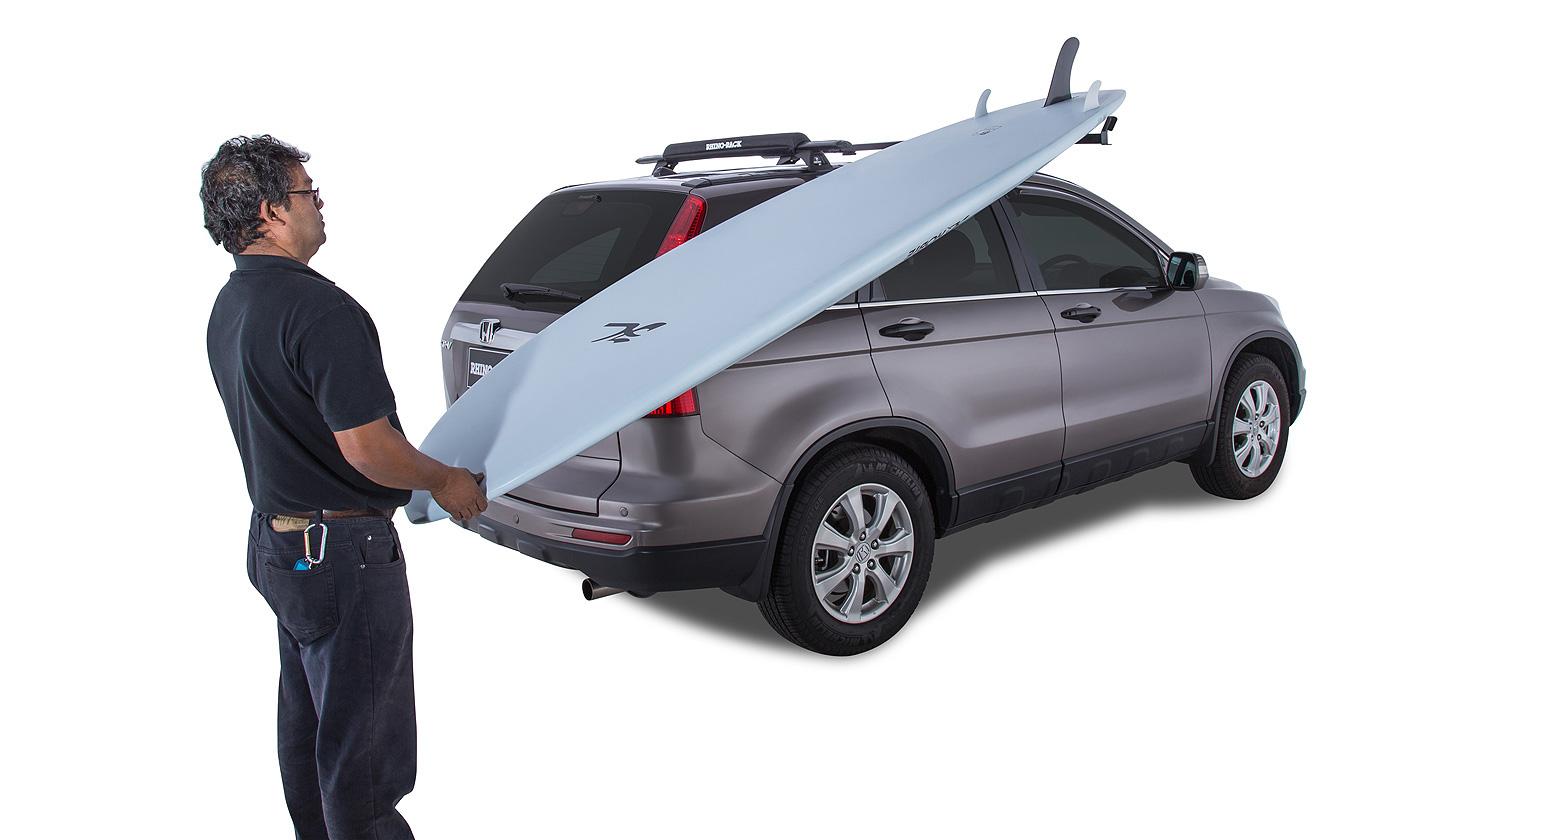 Rhino Rack Universal Side Loader Rack for Kayaks//Canoes